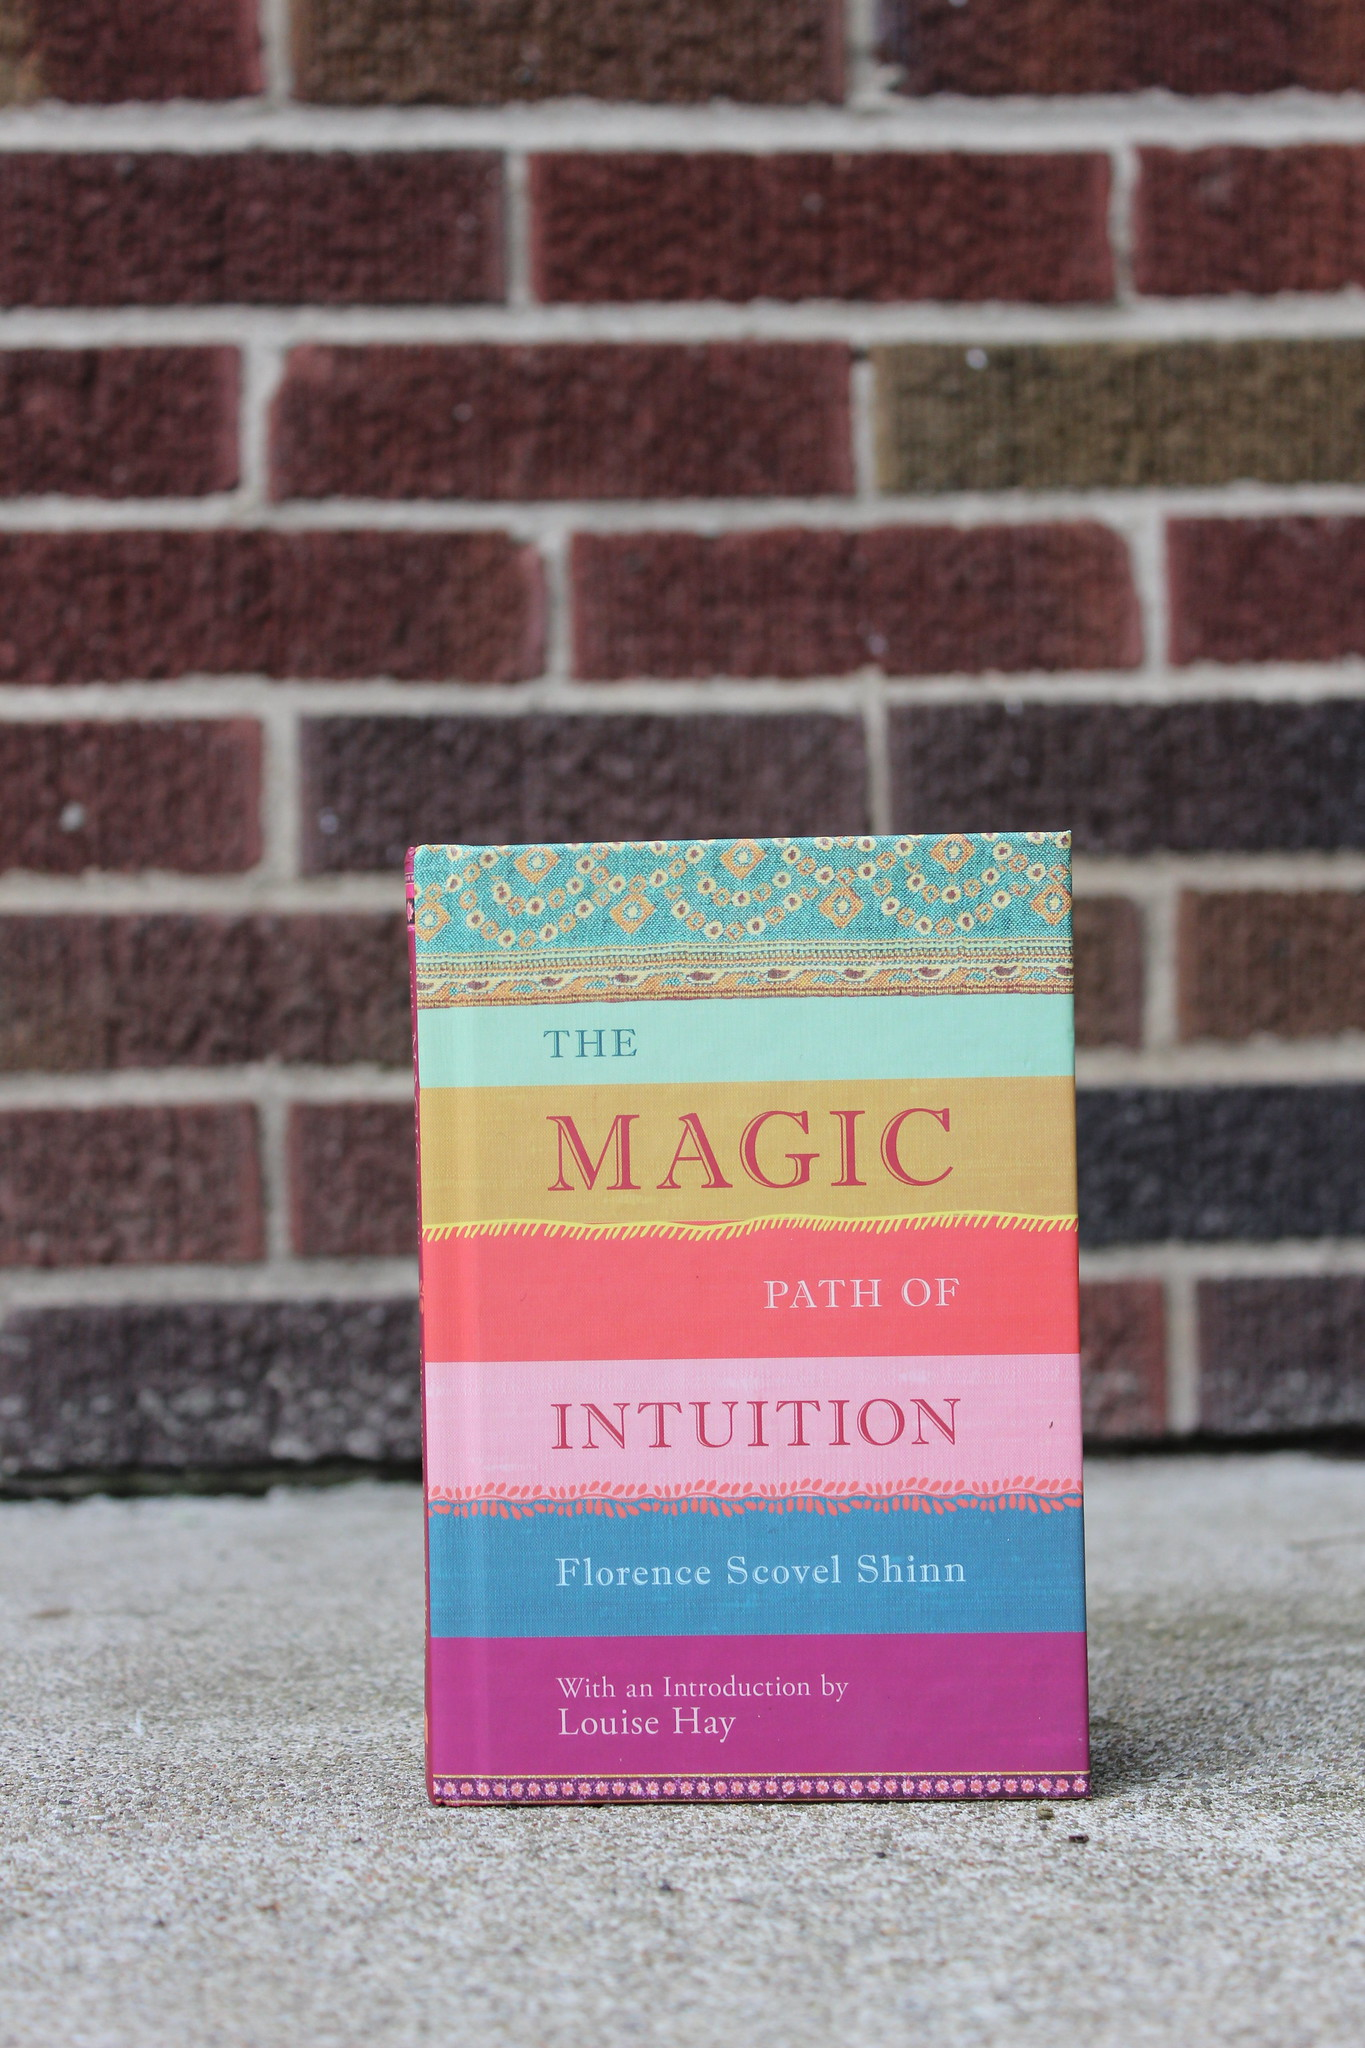 Florence Scovell Shinn books